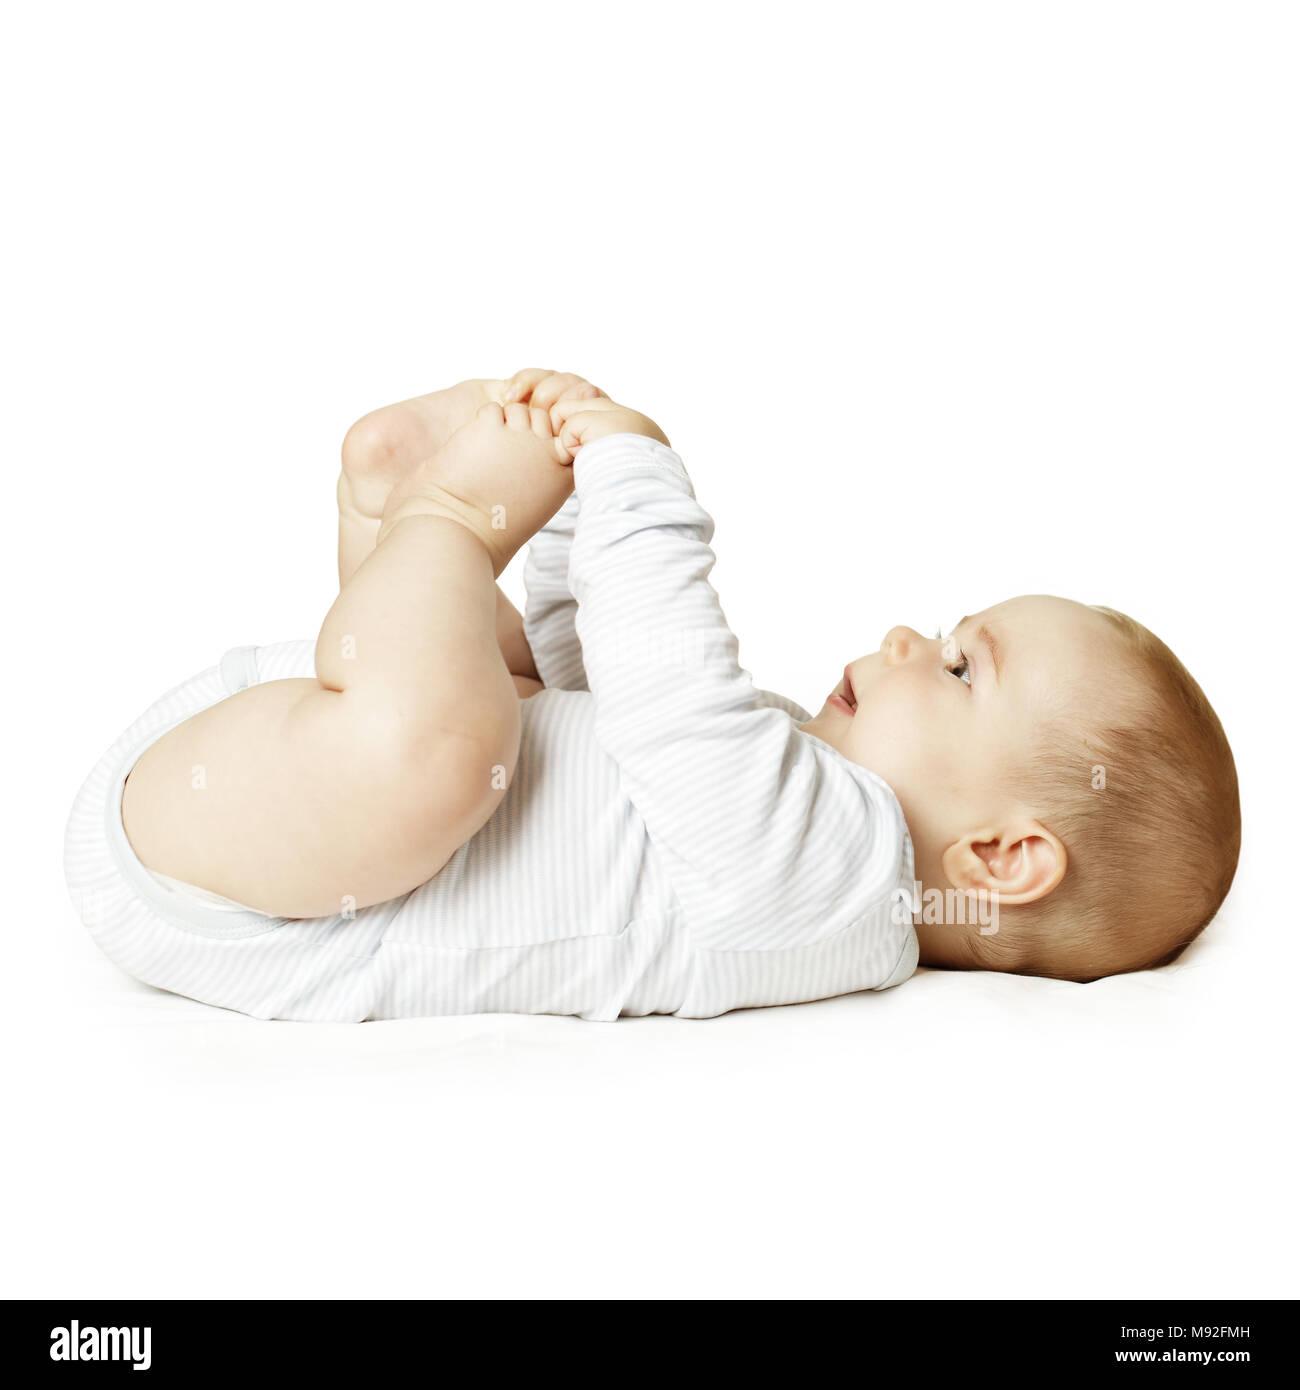 Lying baby looking up - Stock Image